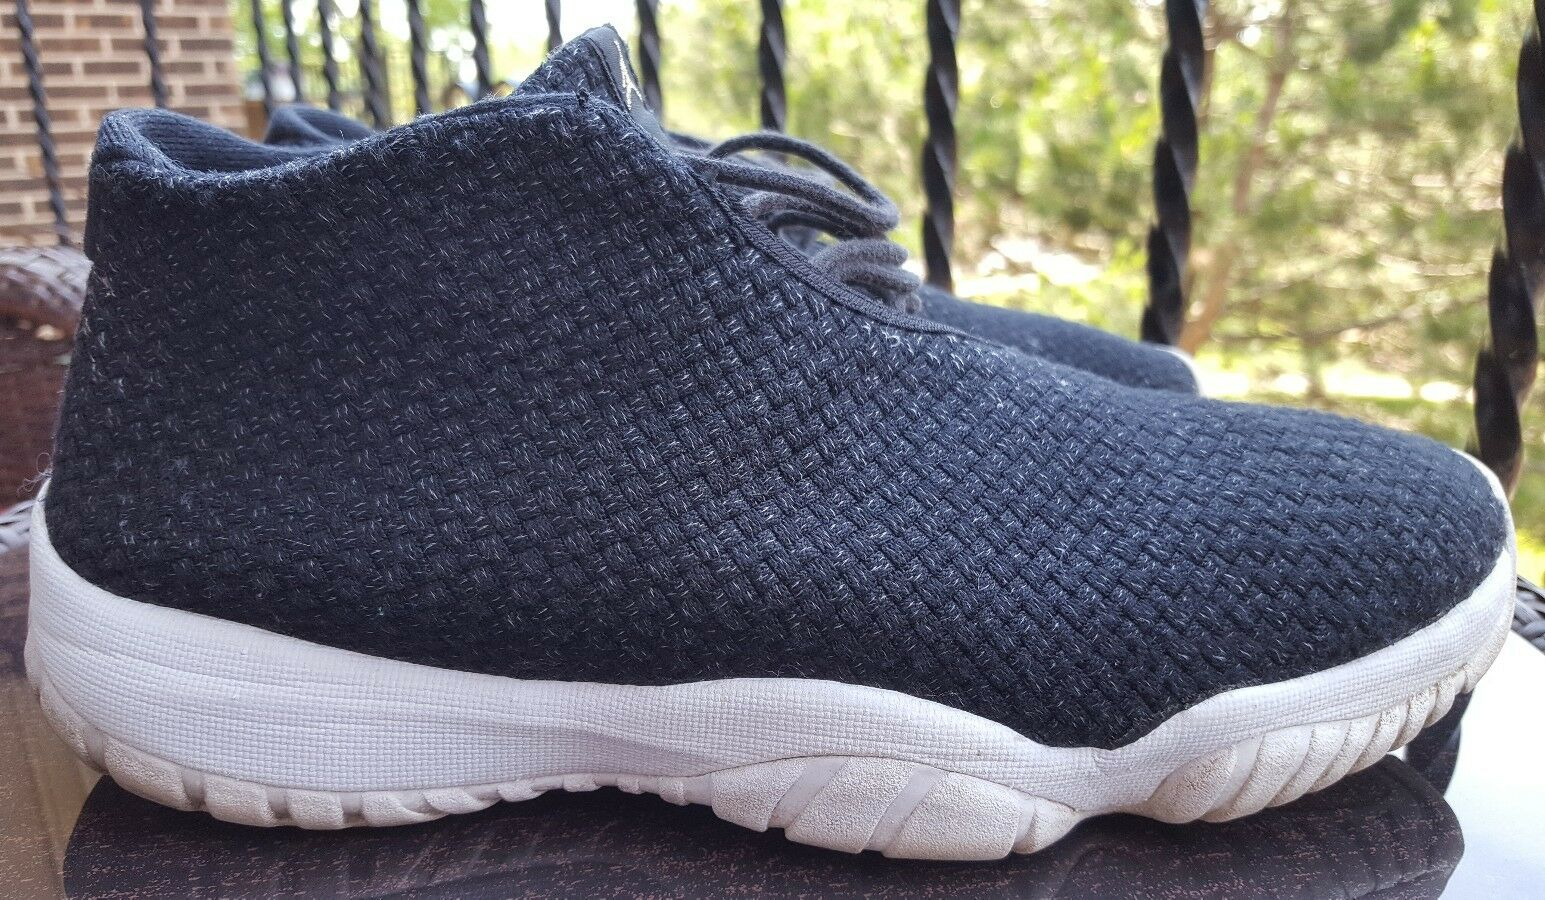 Nike Air Jordan Future, Black White Oreo, 656503-021, Men Basketball shoes, SZ 12